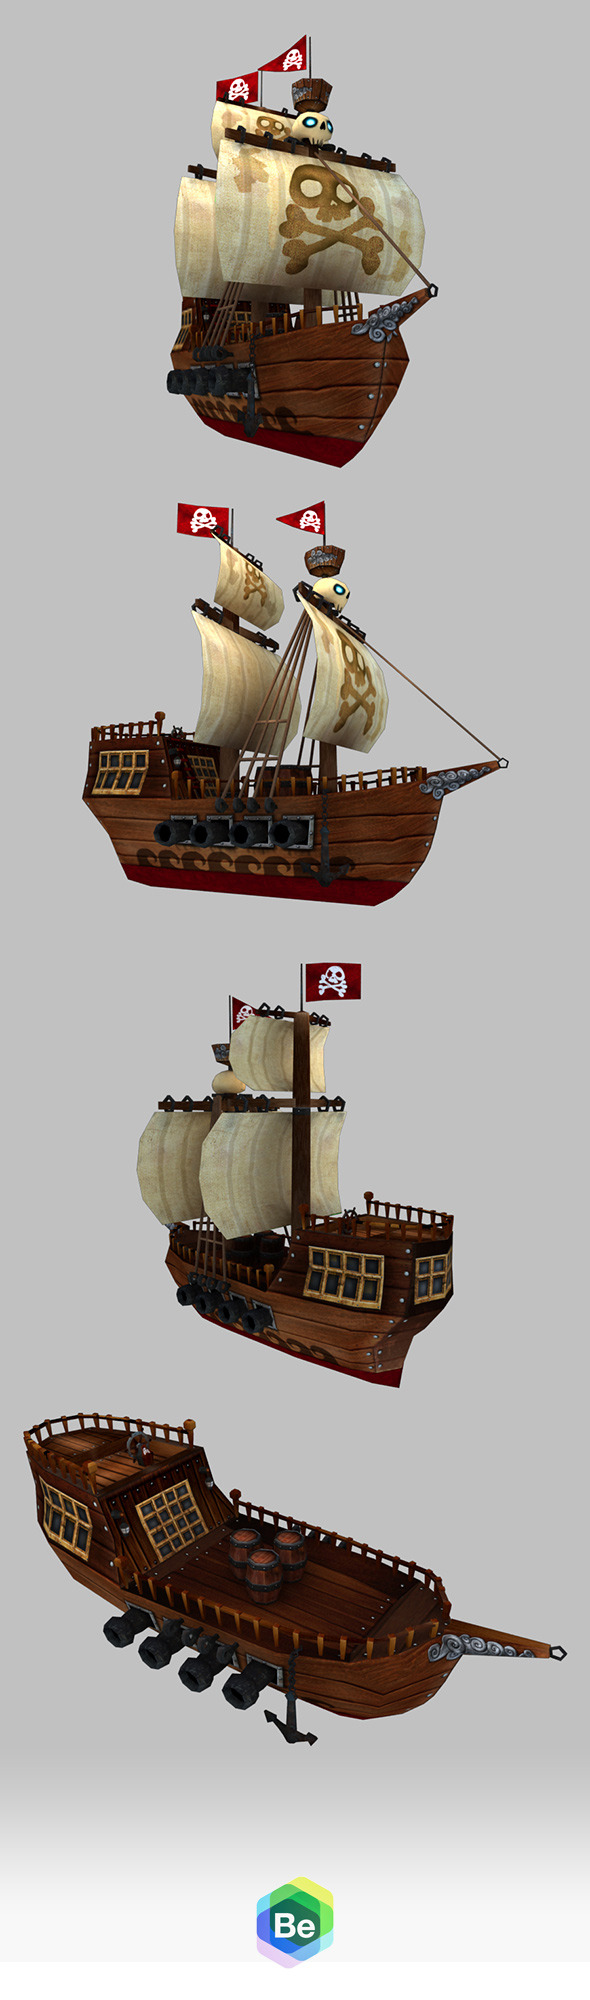 3DOcean Low Poly Cartoonish Pirate Ship 5886141